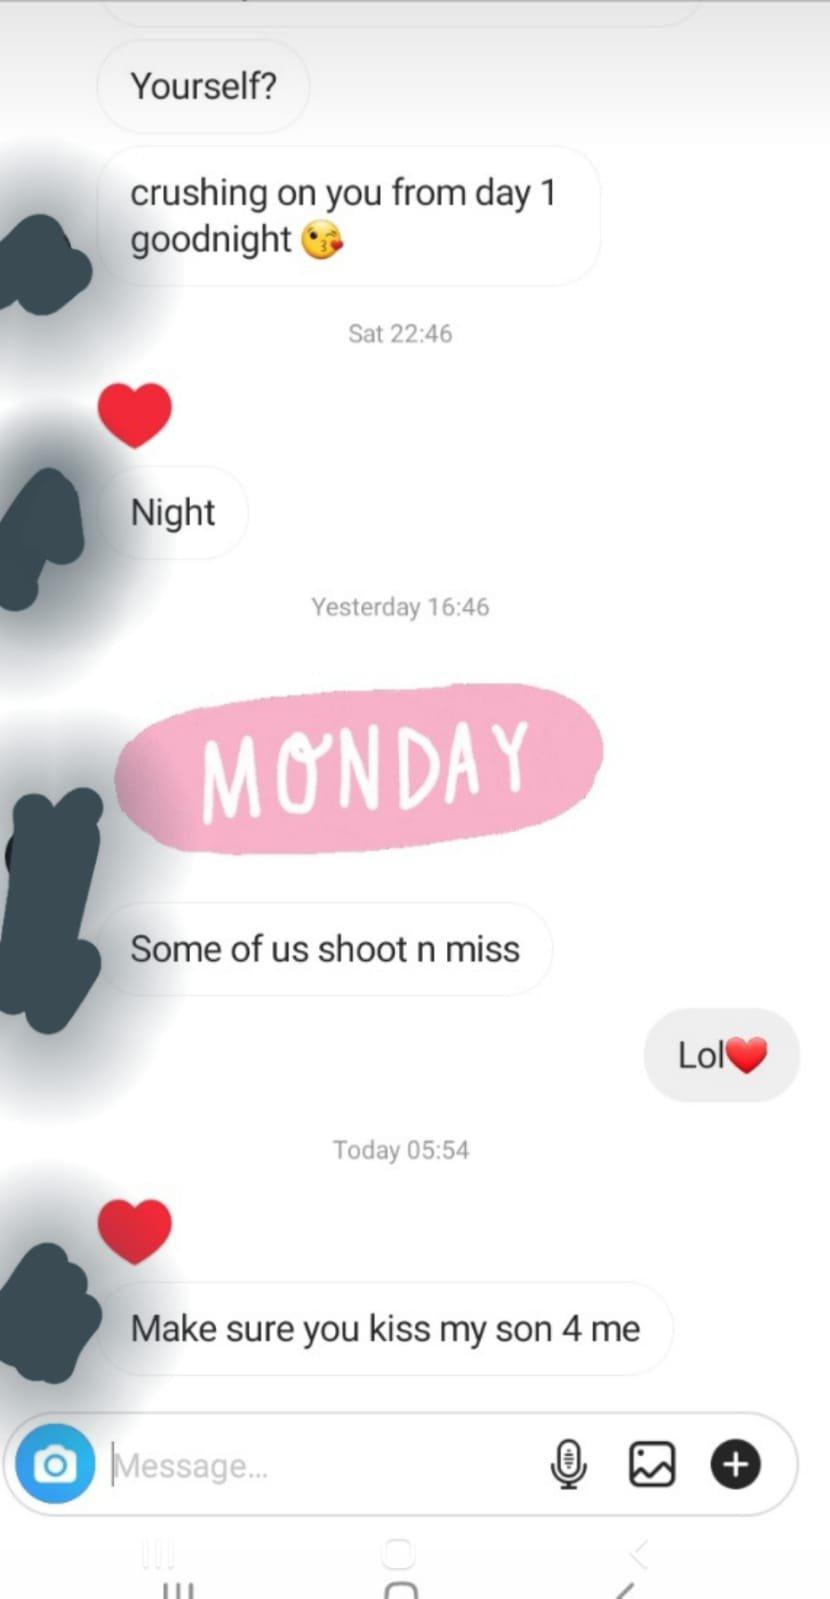 J Sbu screenshot from Instagram